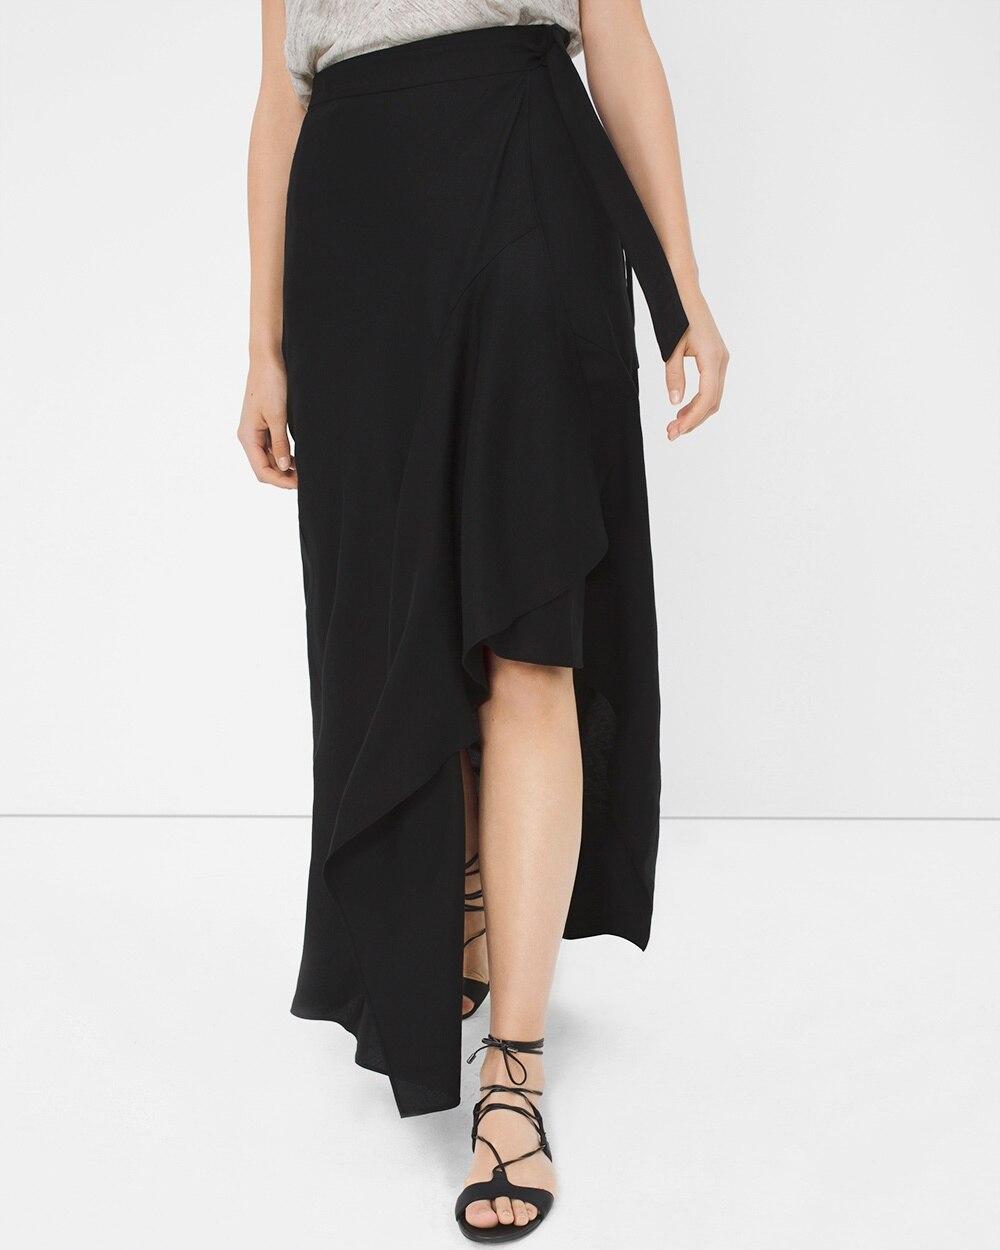 43d65a728c Wrap Maxi Skirt - White House Black Market